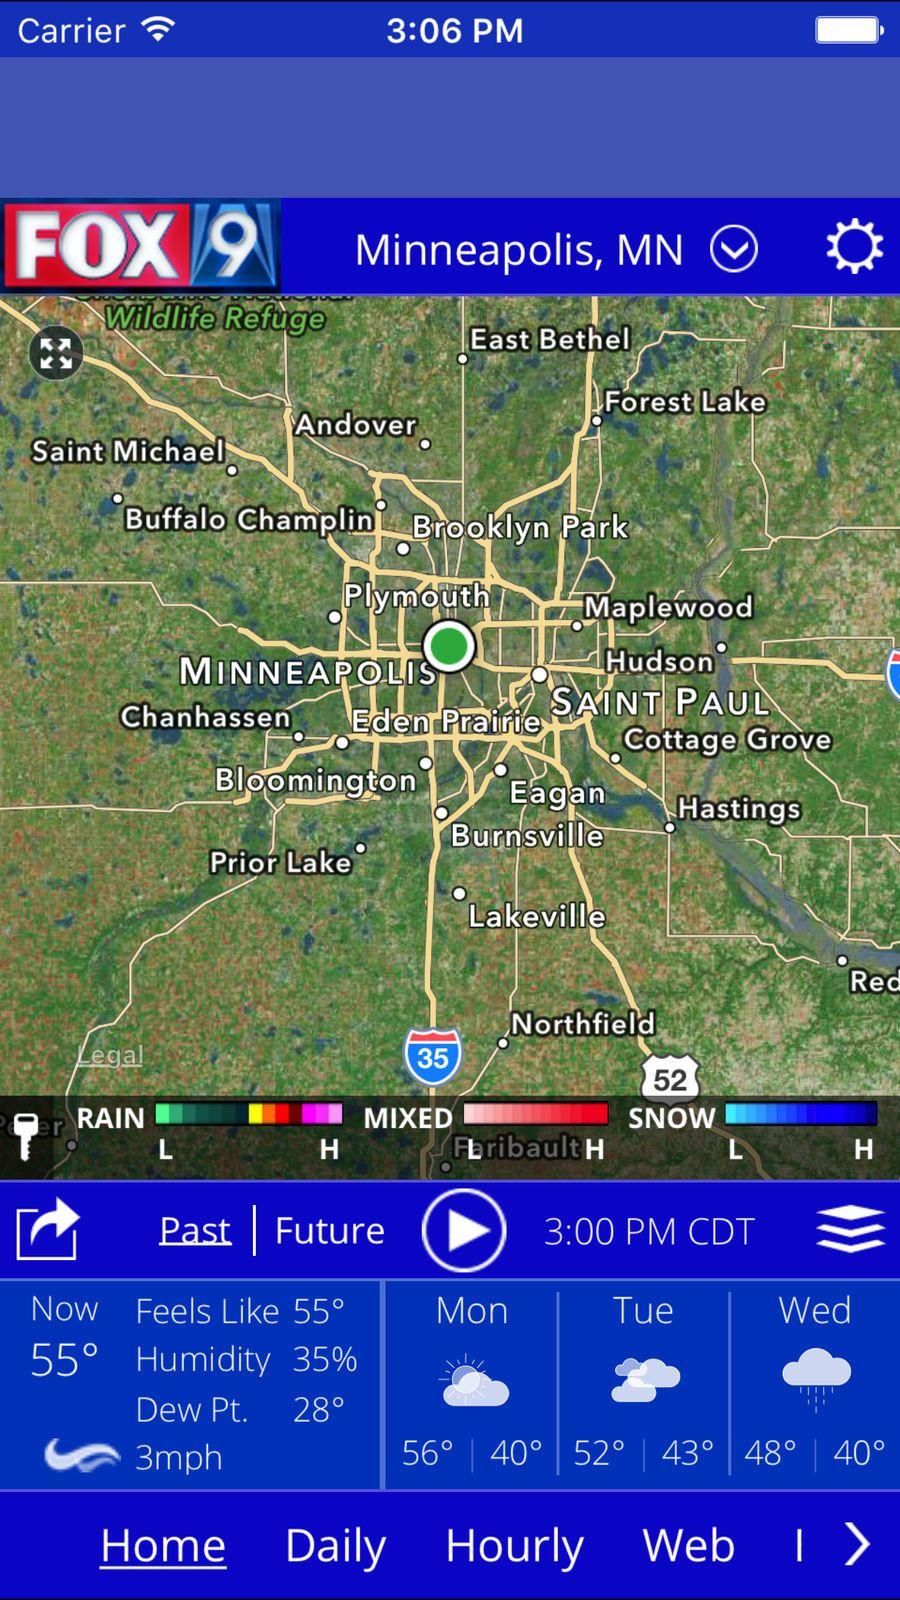 Fox 9 Weather Station Television Kmsp Ios Eagan Burnsville Maplewood